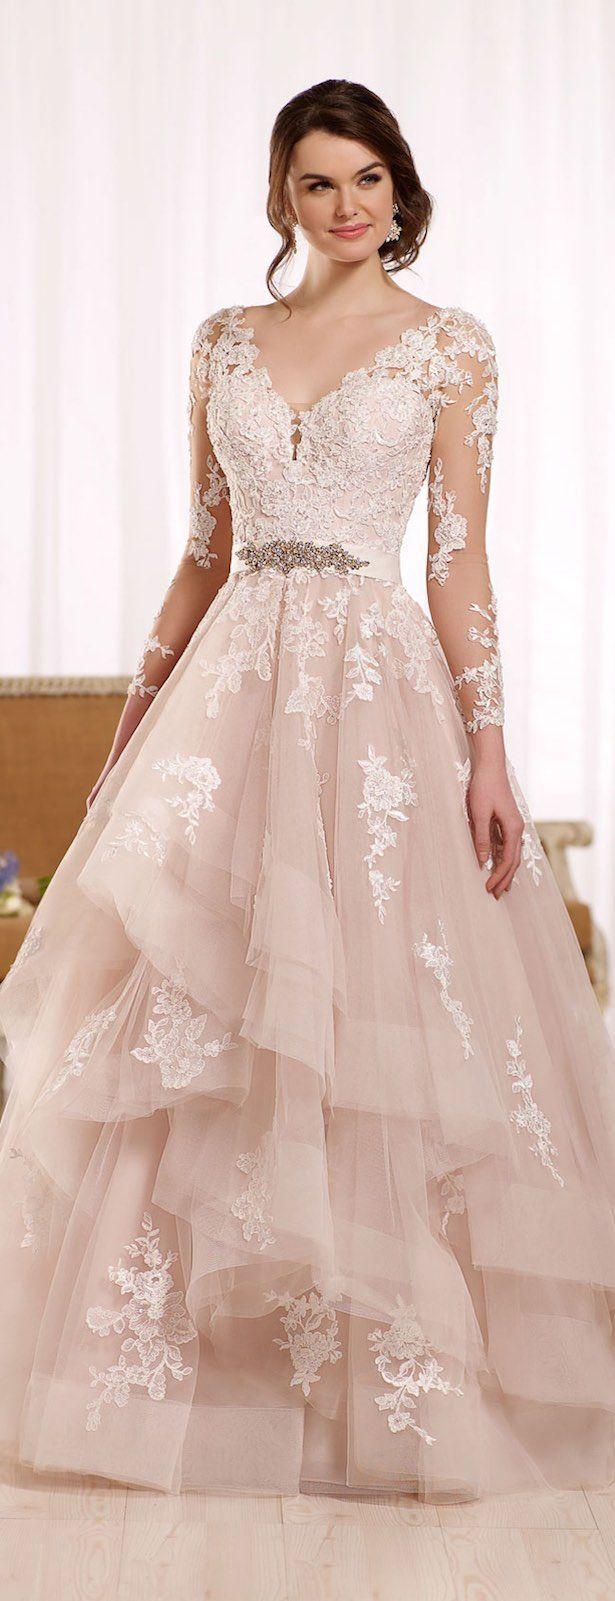 84 best Wedding dresses images on Pinterest | Gown wedding, Wedding ...